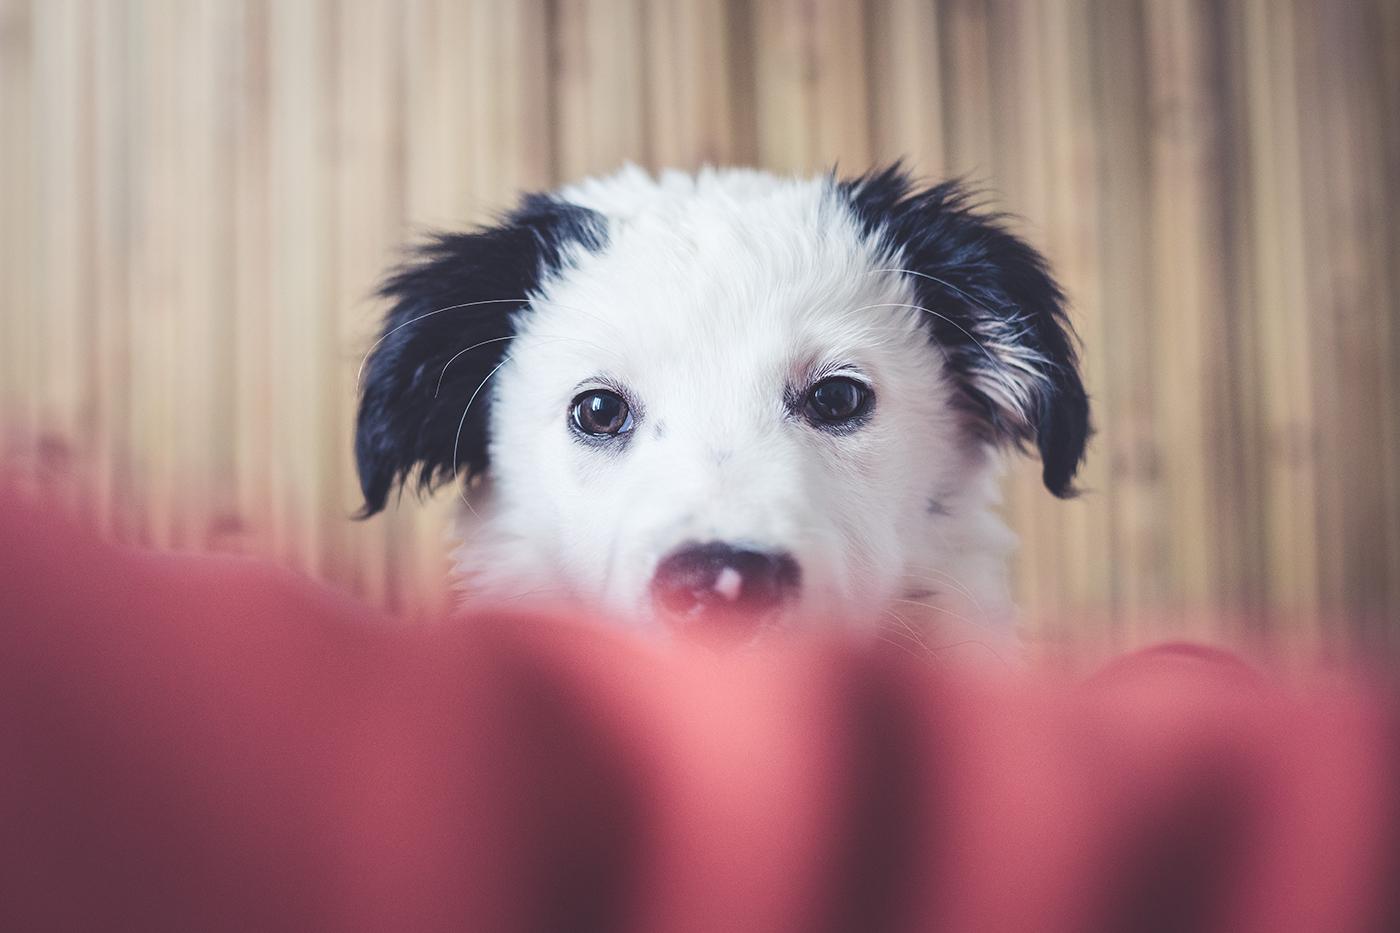 photographe-animalier-chien-Canin-poitiers-guillaume-heraud-11